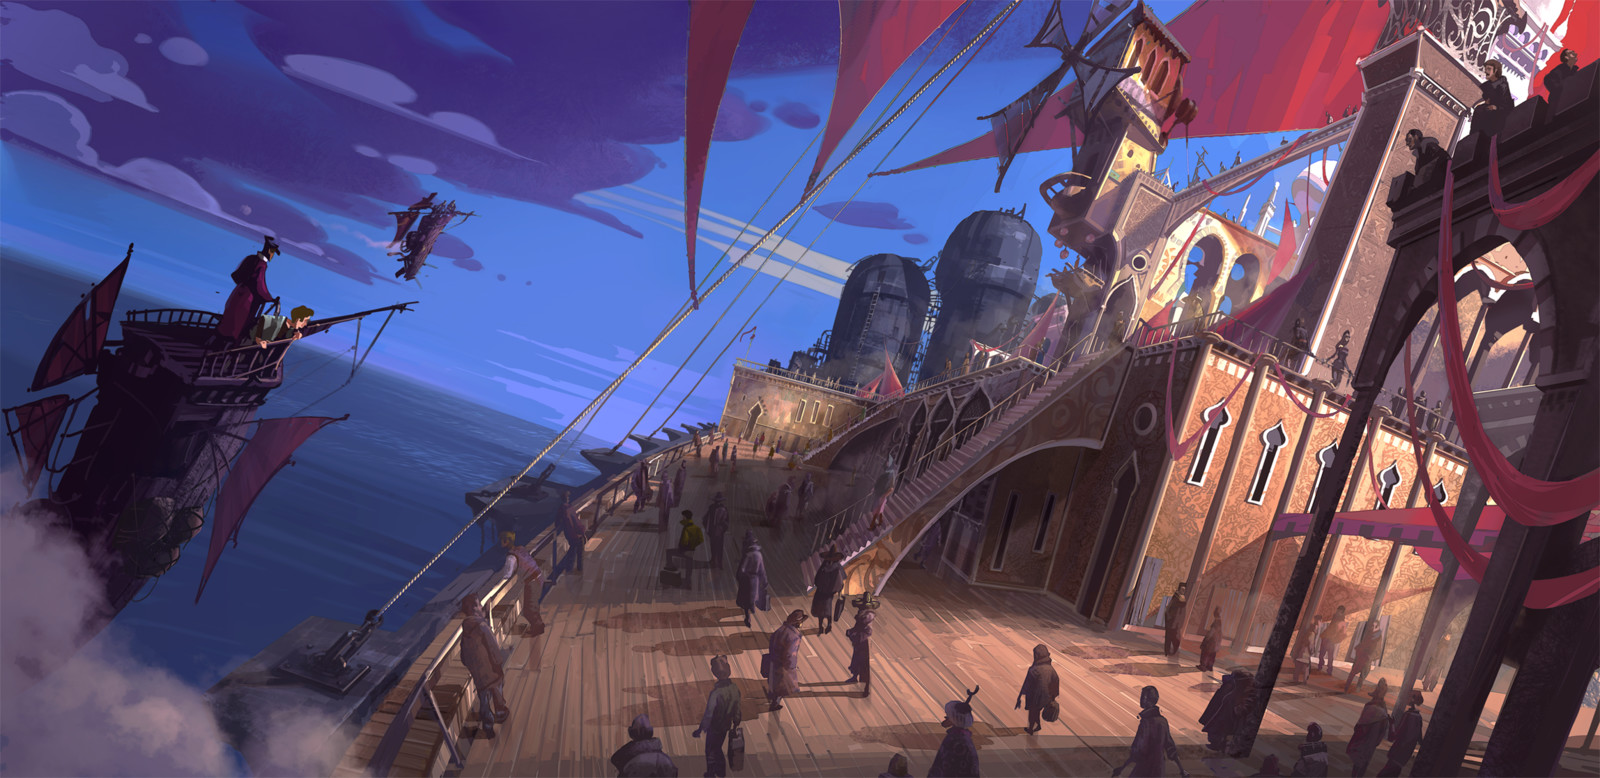 The Alchemist, Boat ride